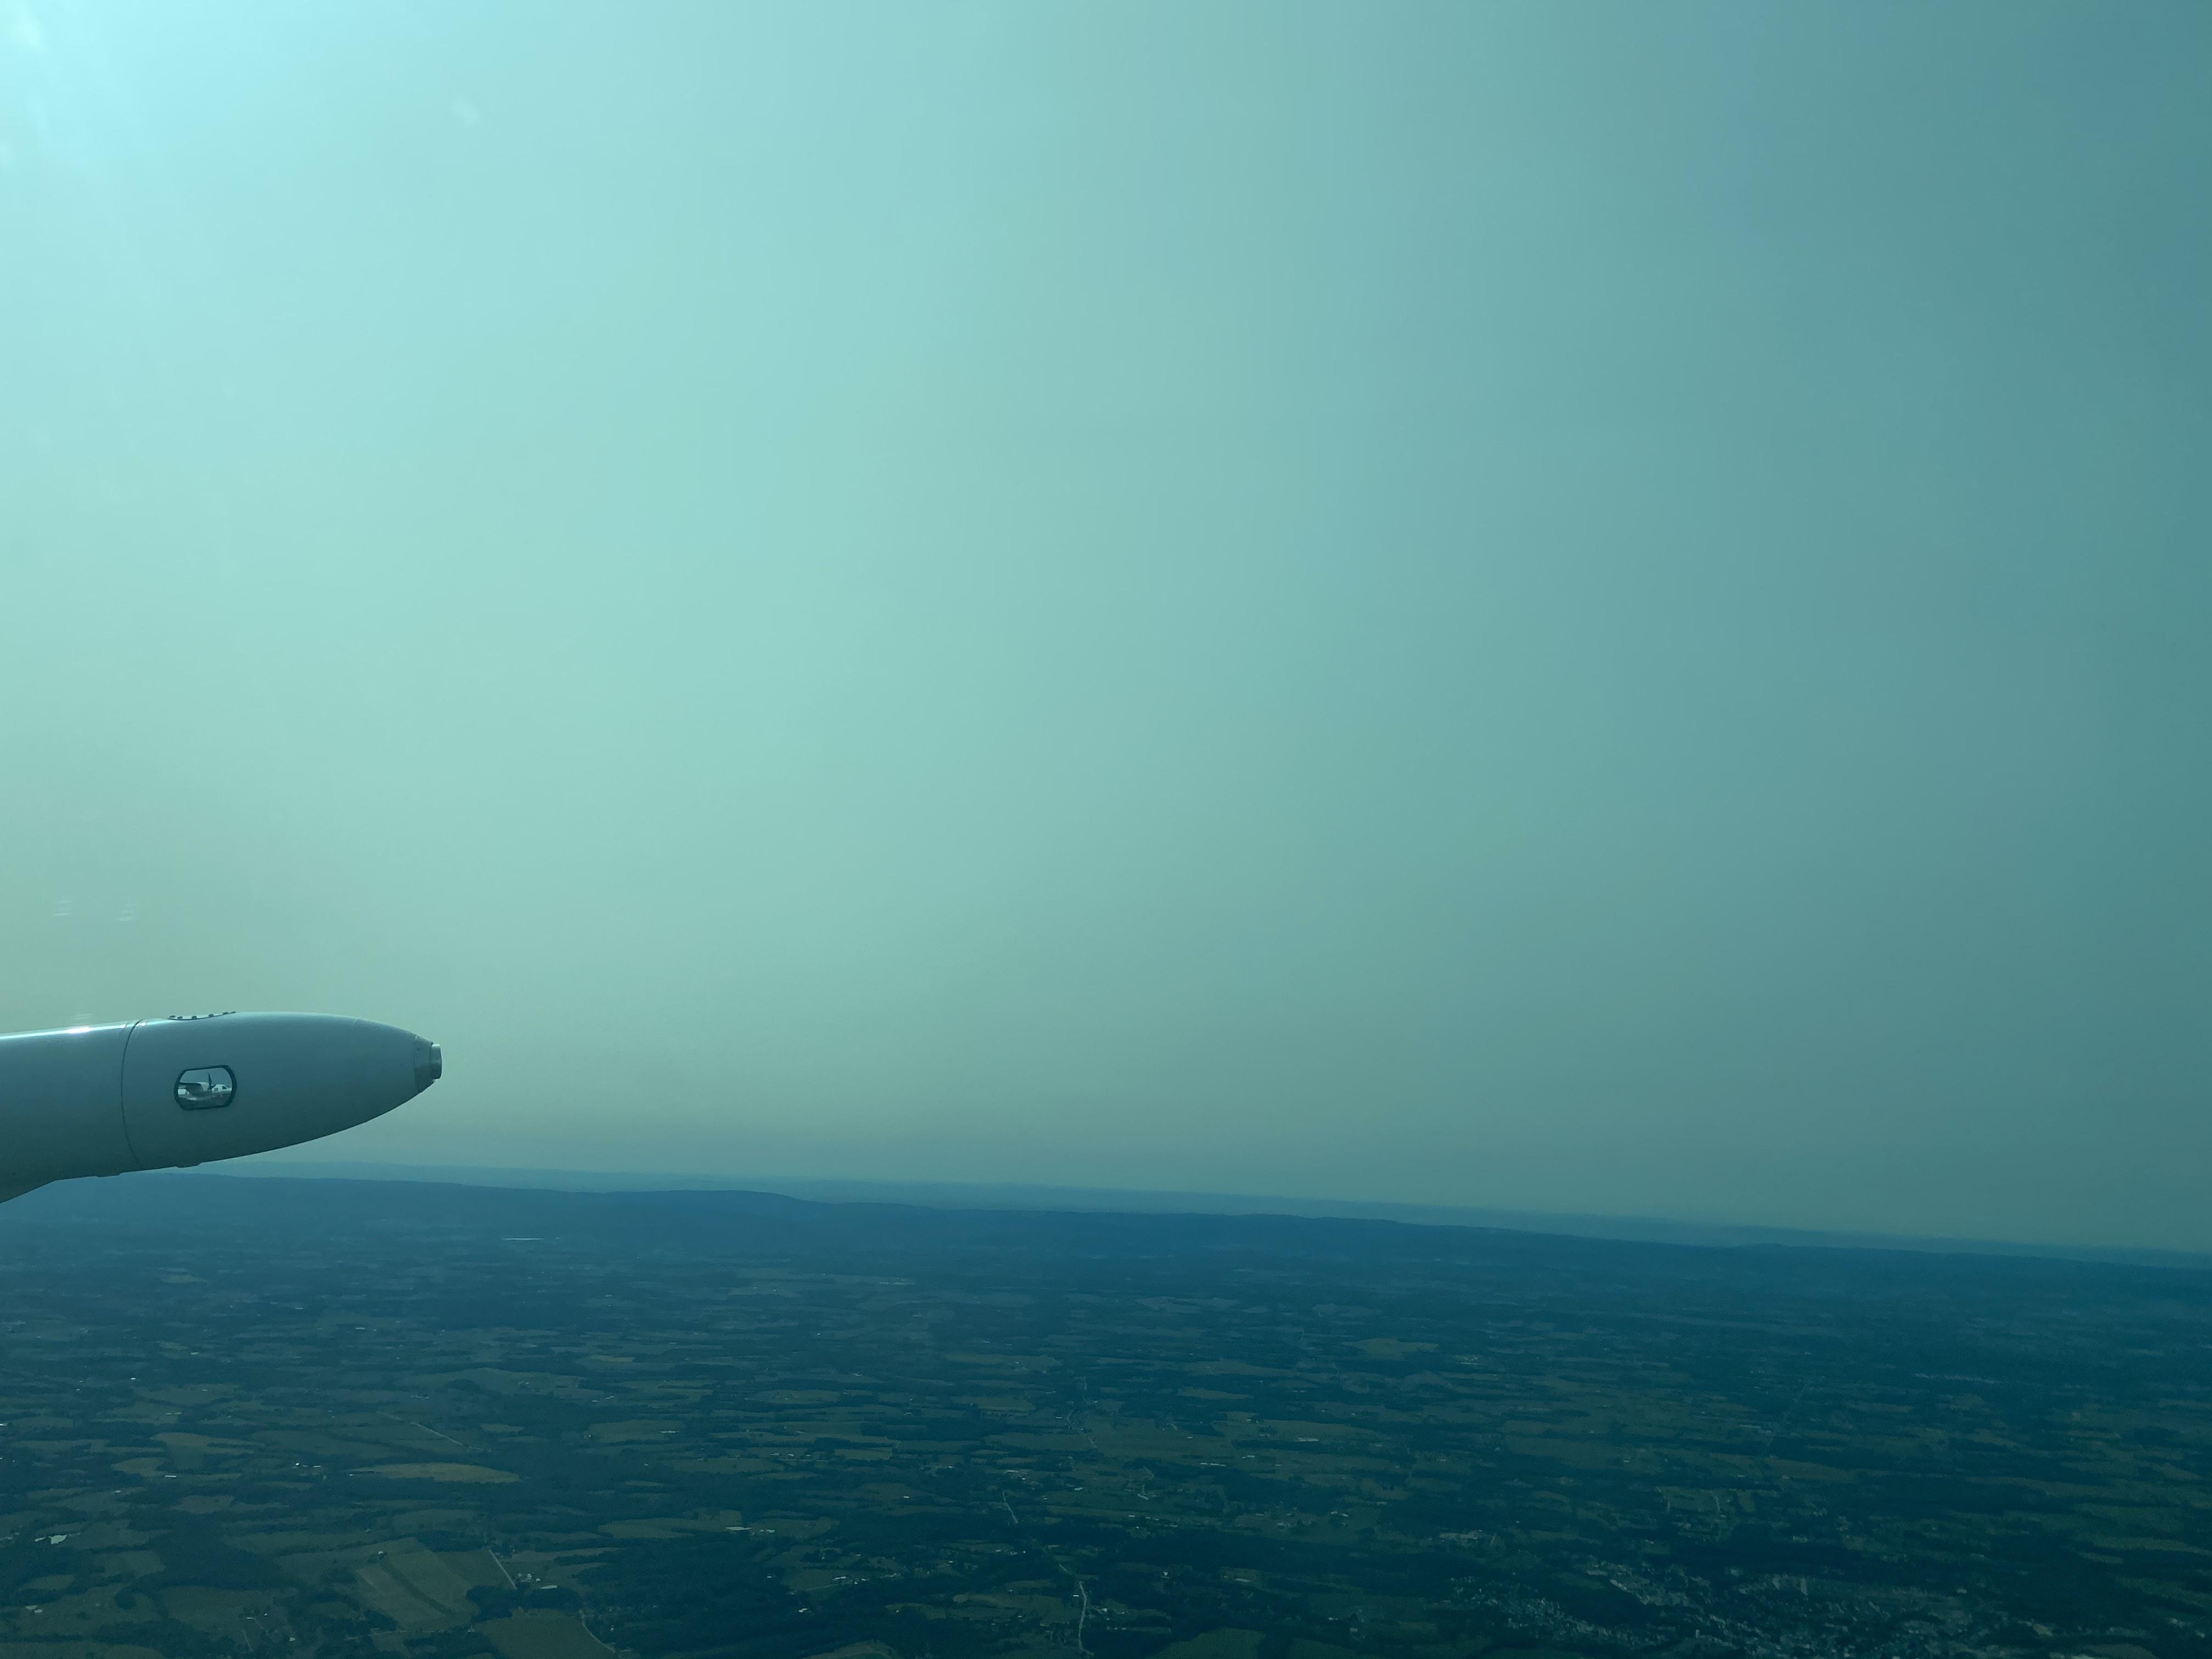 A421087A-52A0-42AF-BF90-02BEA59339DD.jpeg